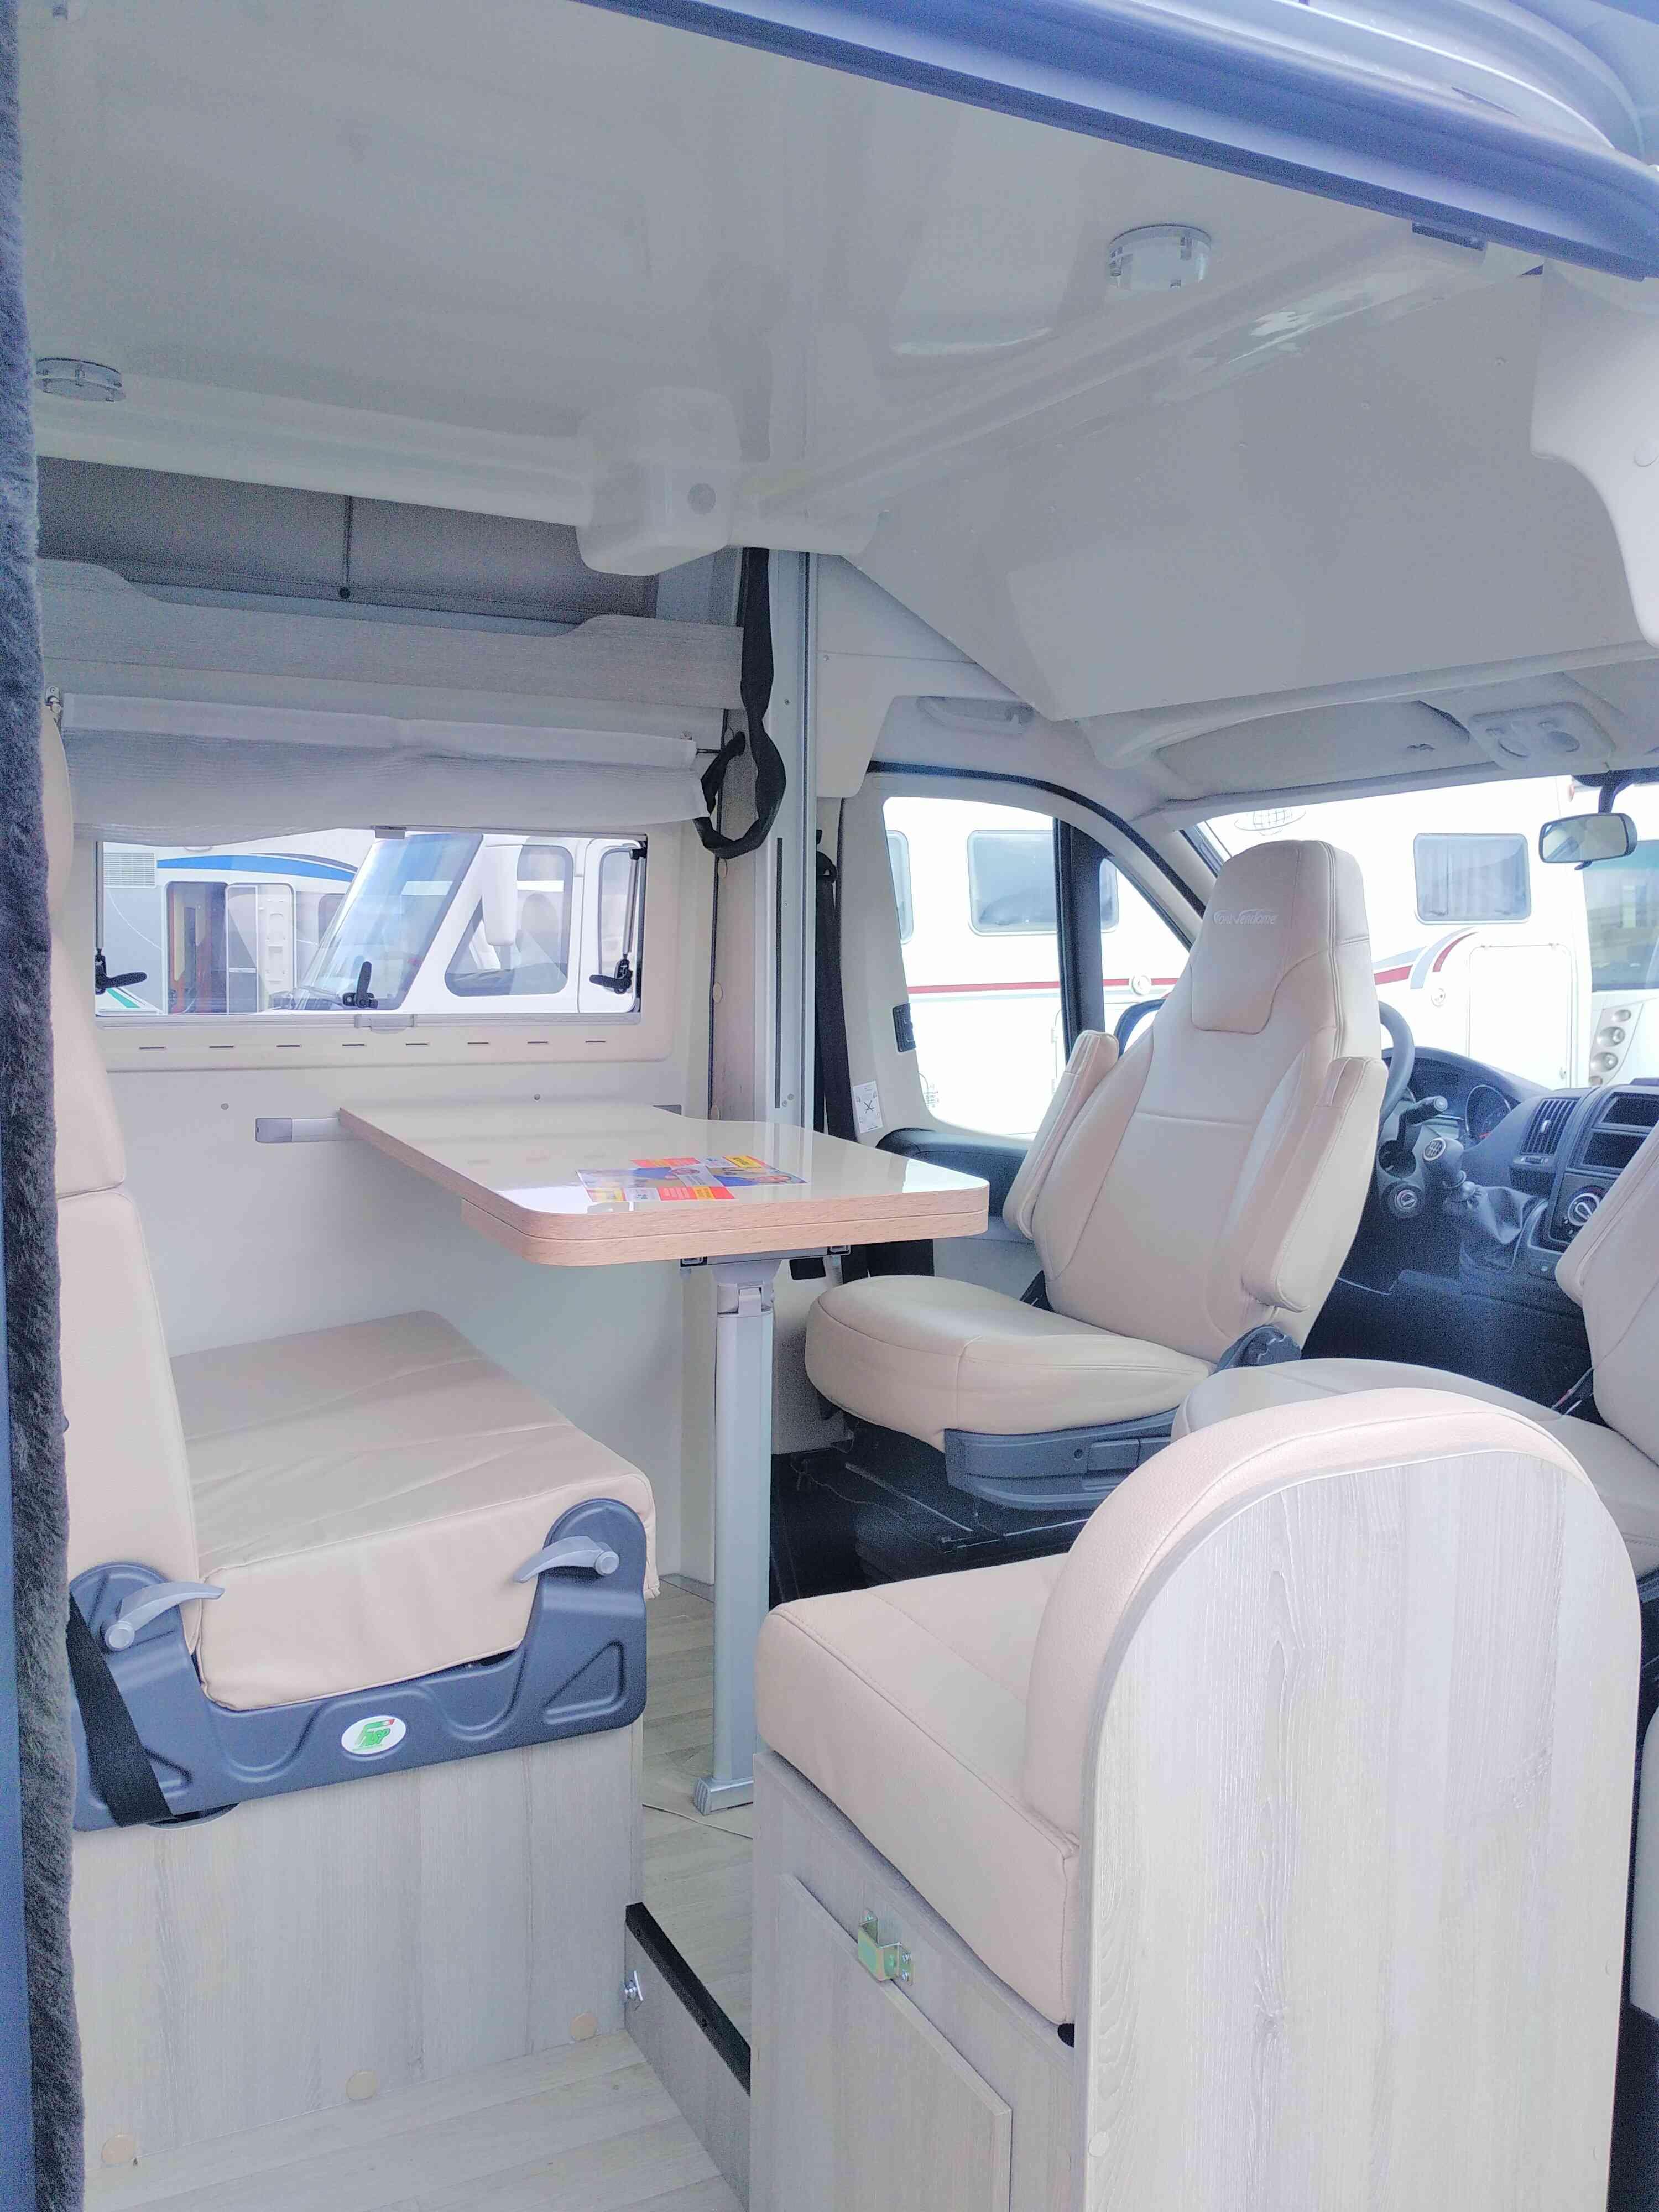 camping-car Fiat FOND VENDOME MONDEA  intérieur  / coin cuisine